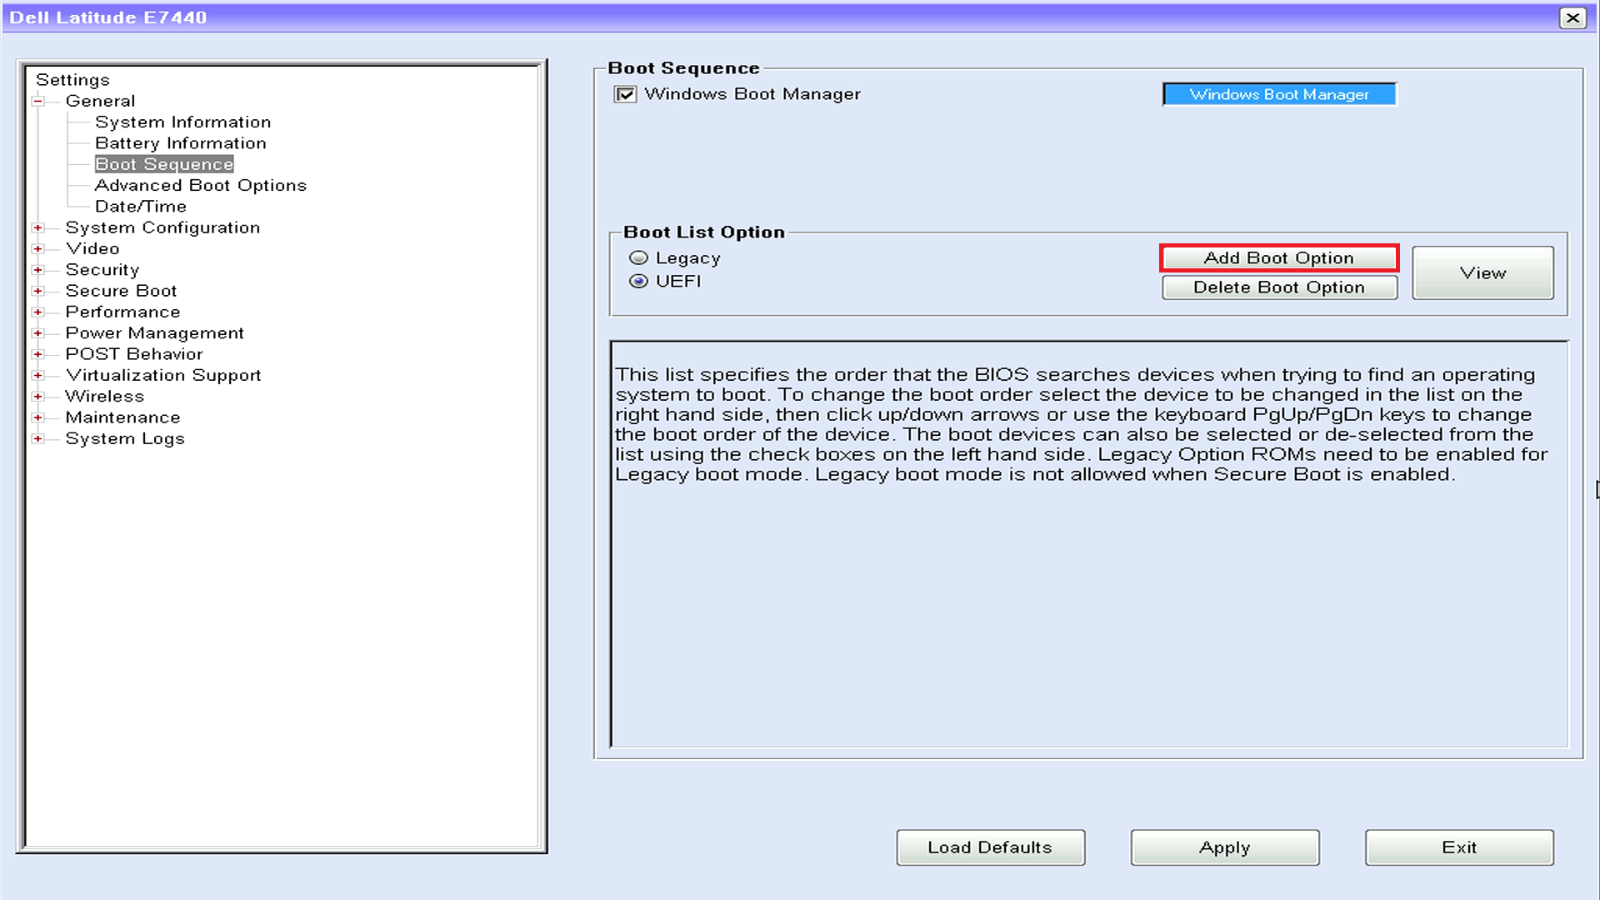 SLN142679_en_US__5UEFI_BIOS_Add_Boot_Option